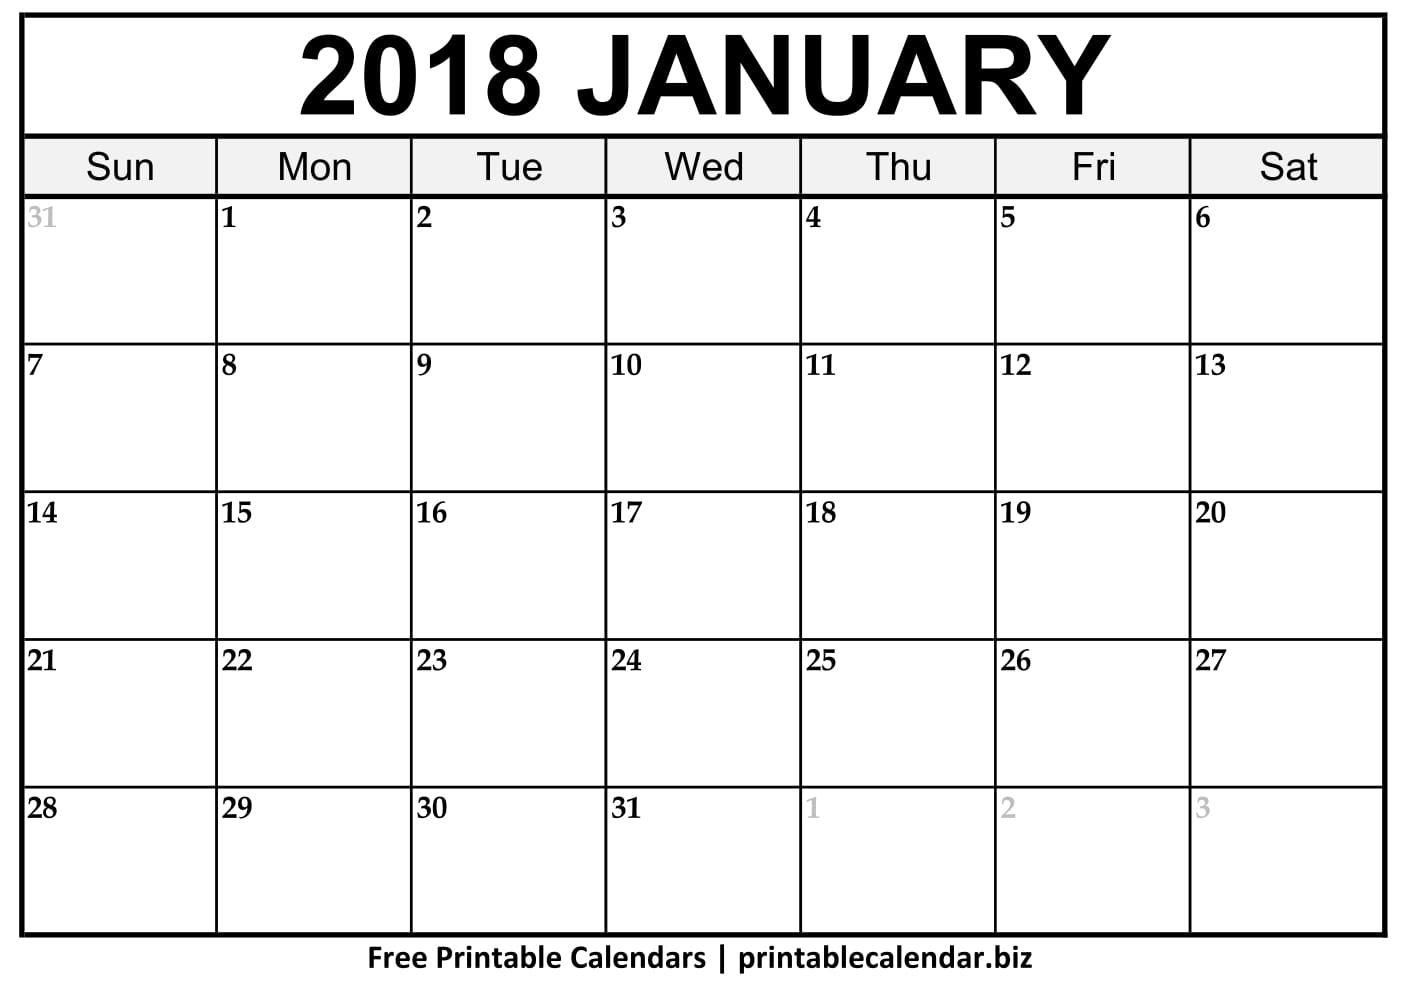 Free Printable Calendar That I Can Edit In 2020 | Calendar